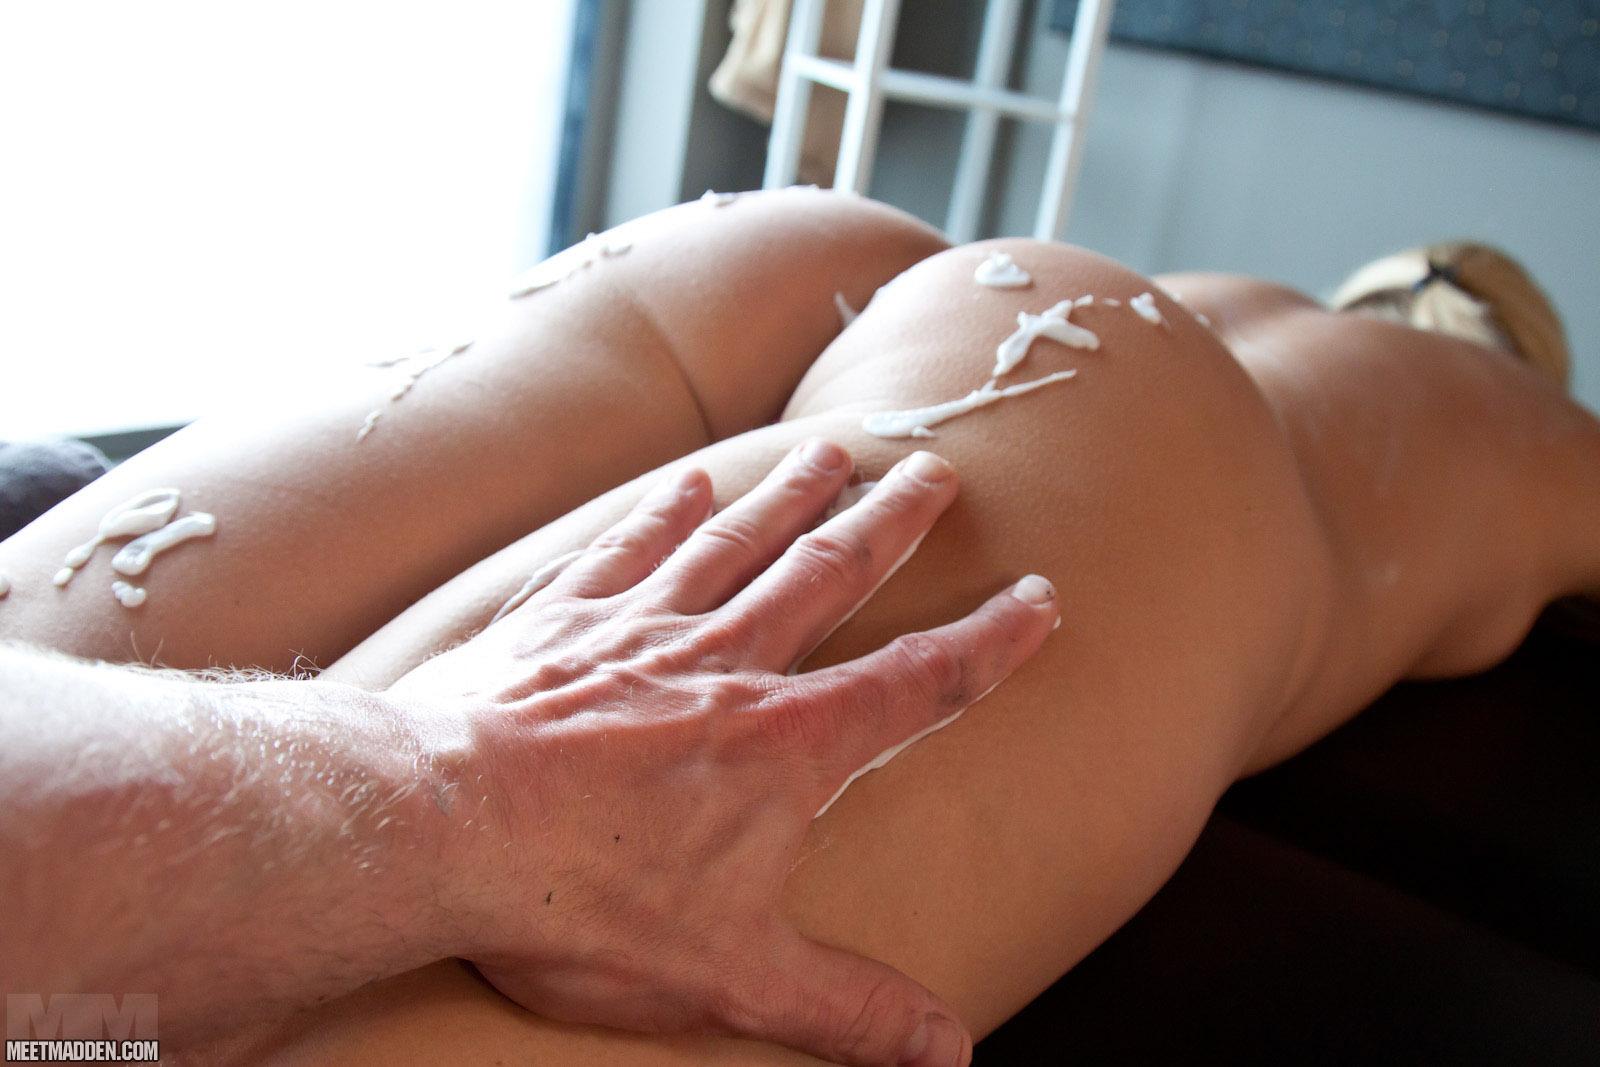 meet erotic massage places